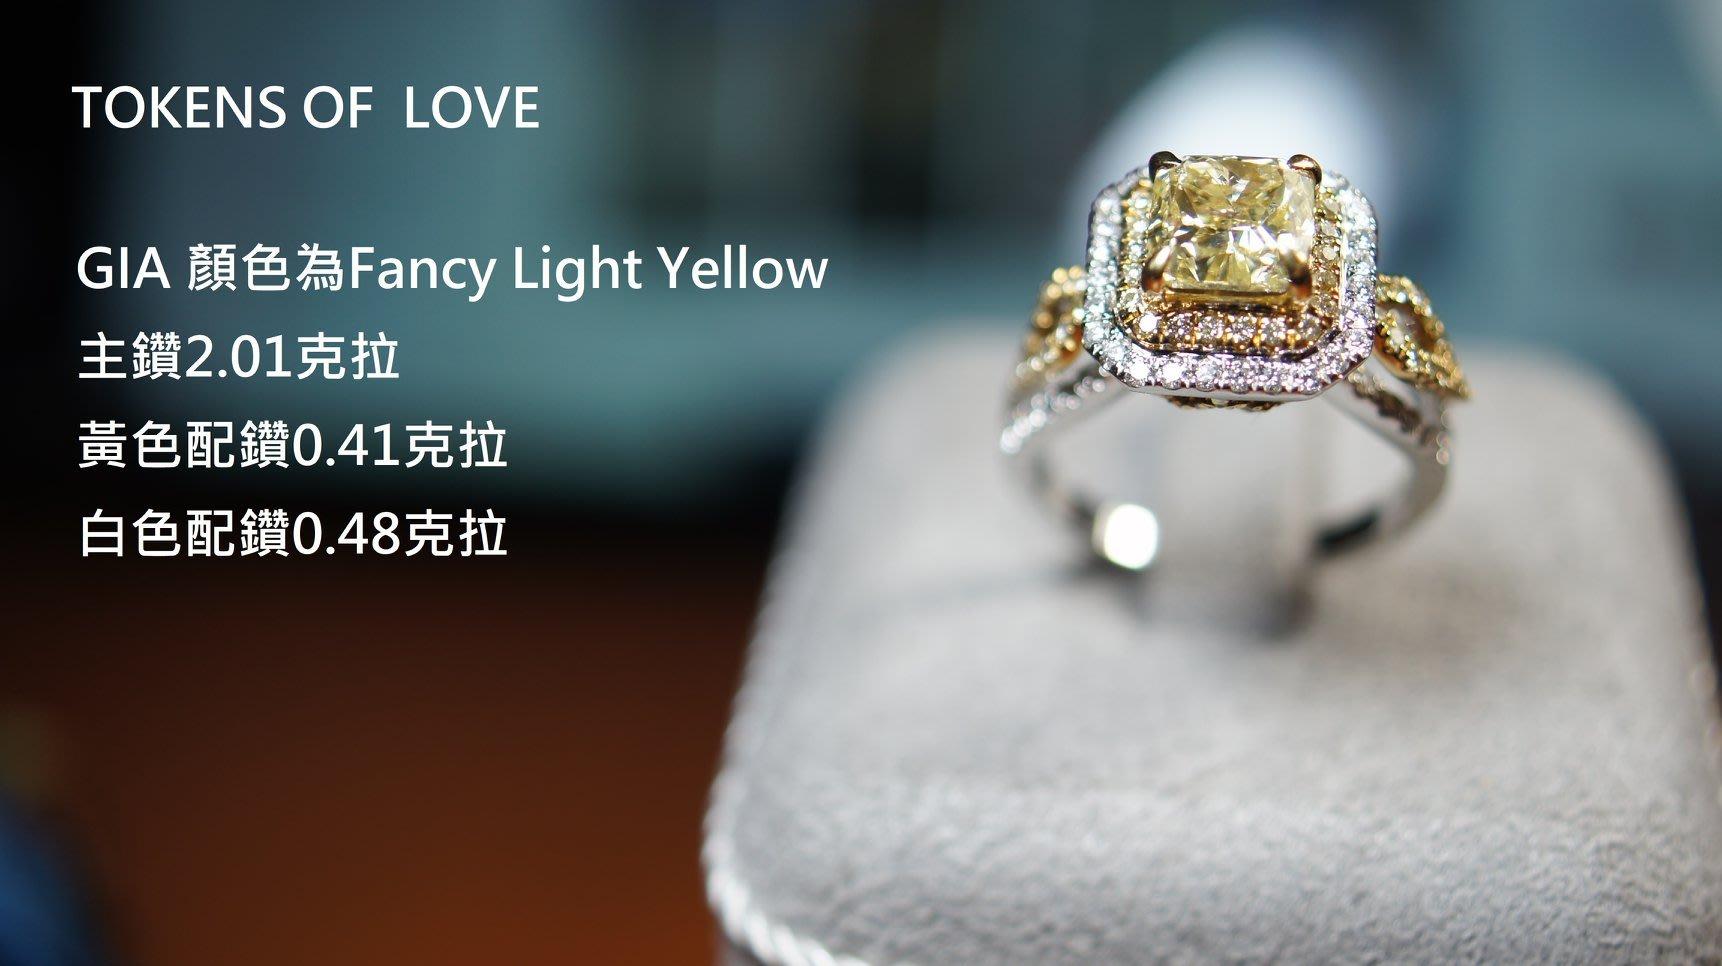 GIA 黃色彩鑽2.01克拉 Fancy light yellow